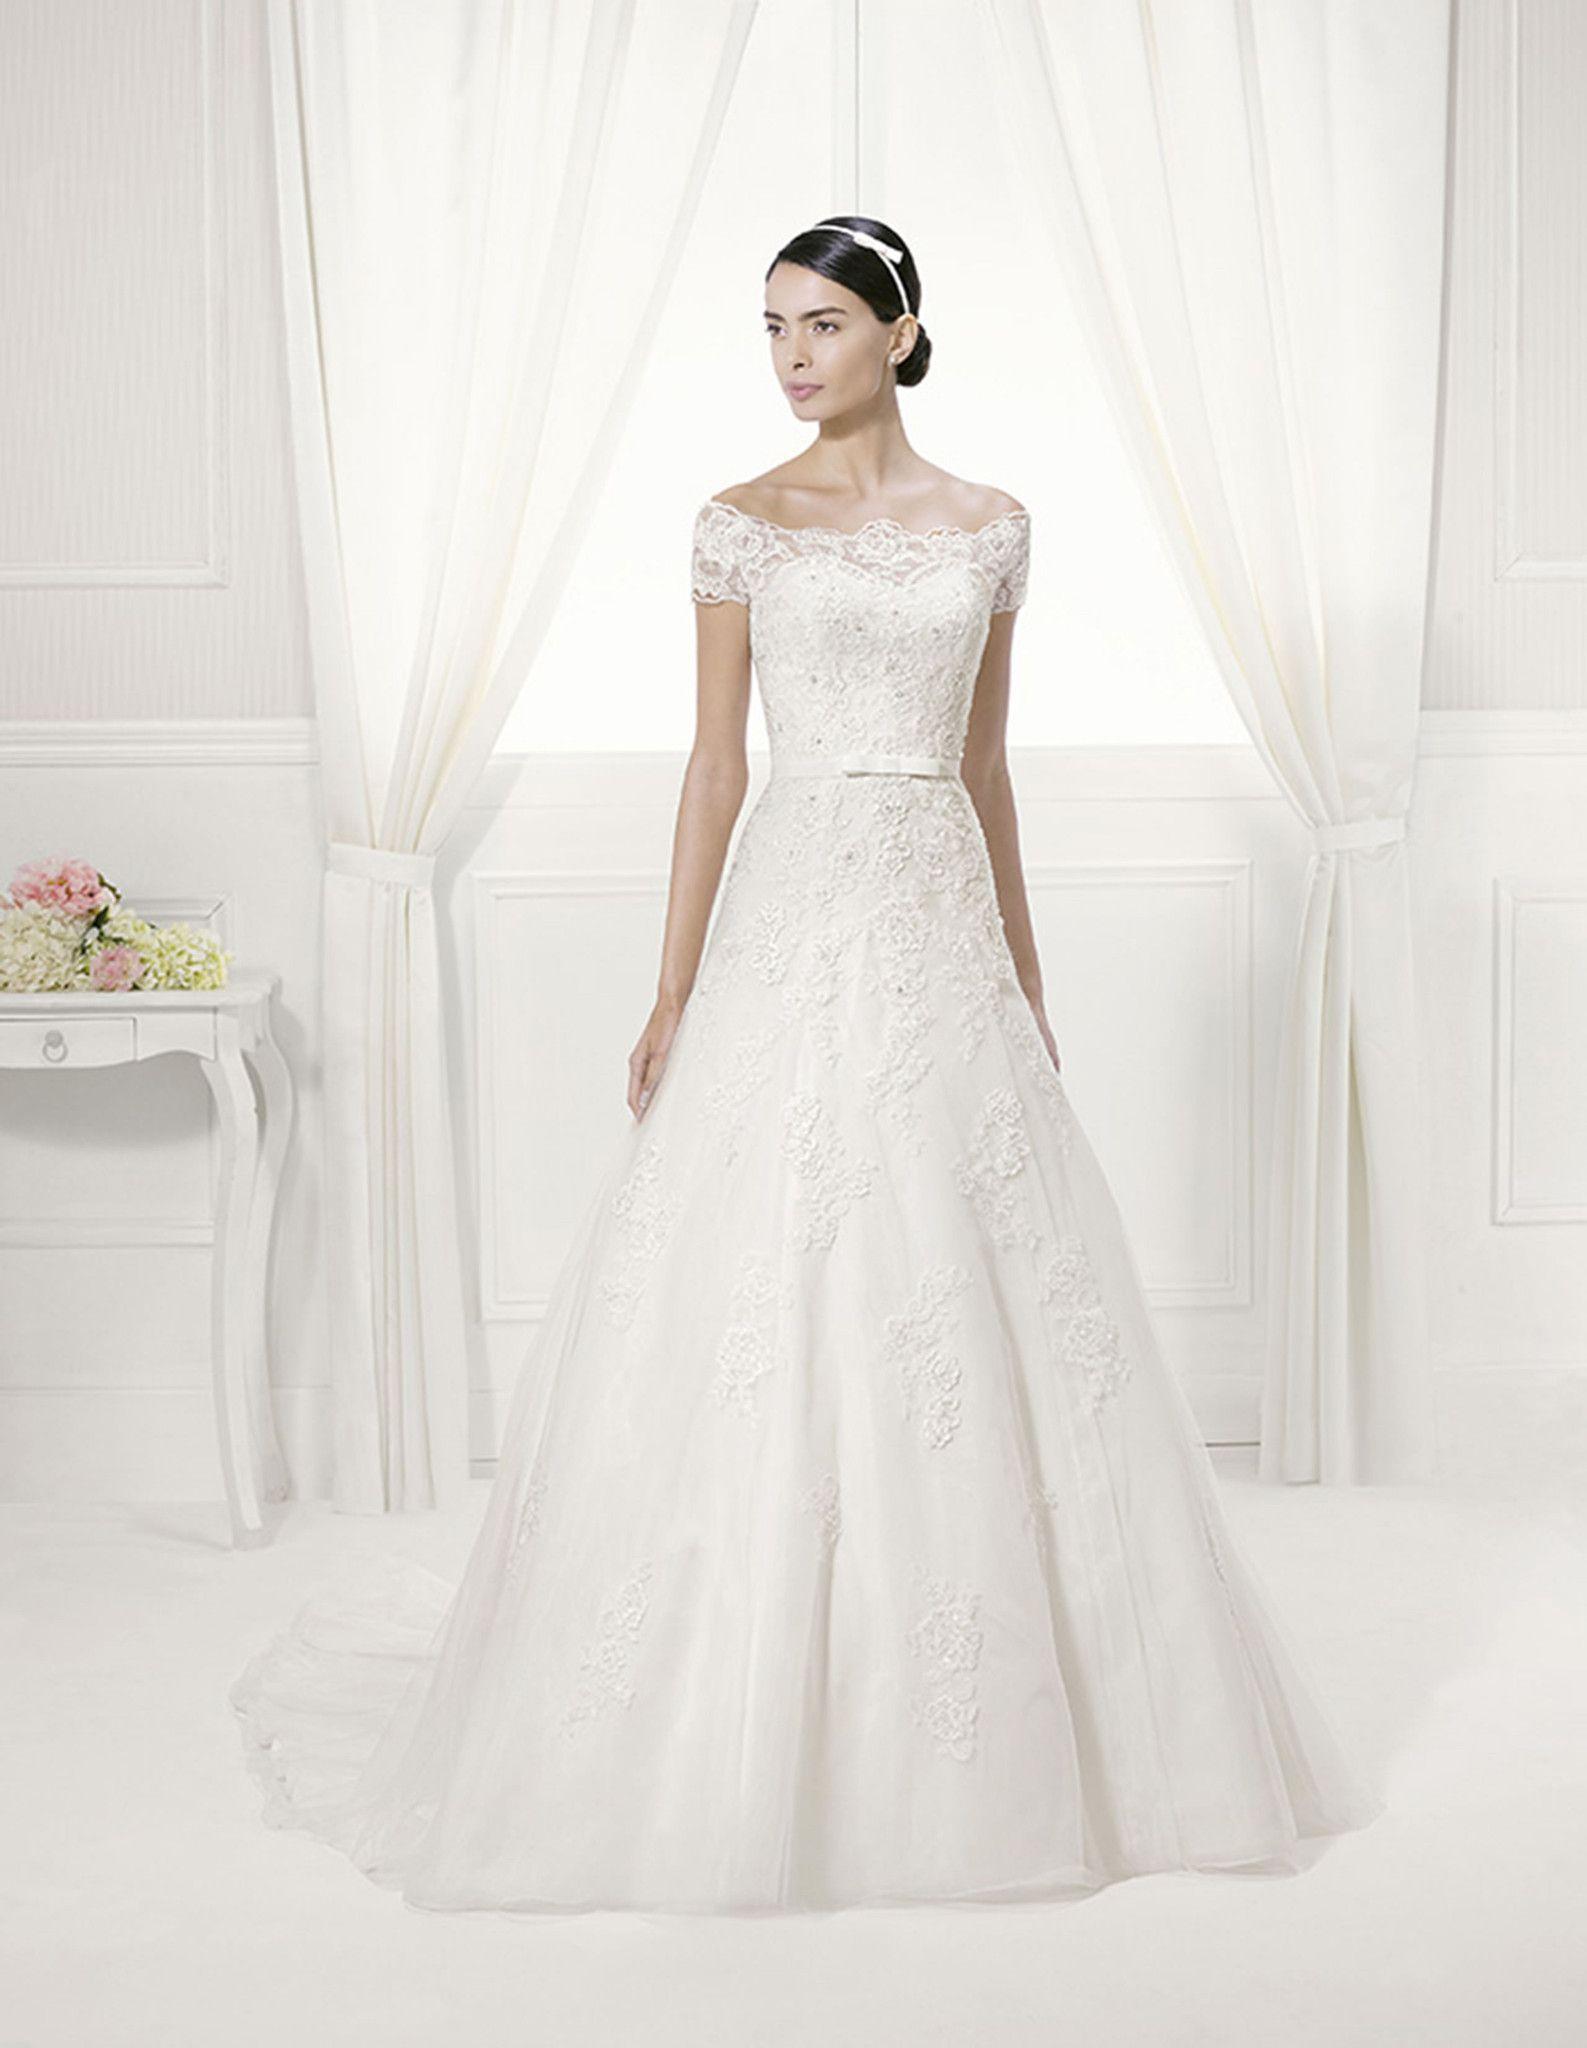 Alma Novia Ferrol from LUXEredux Bridal Wedding dresses